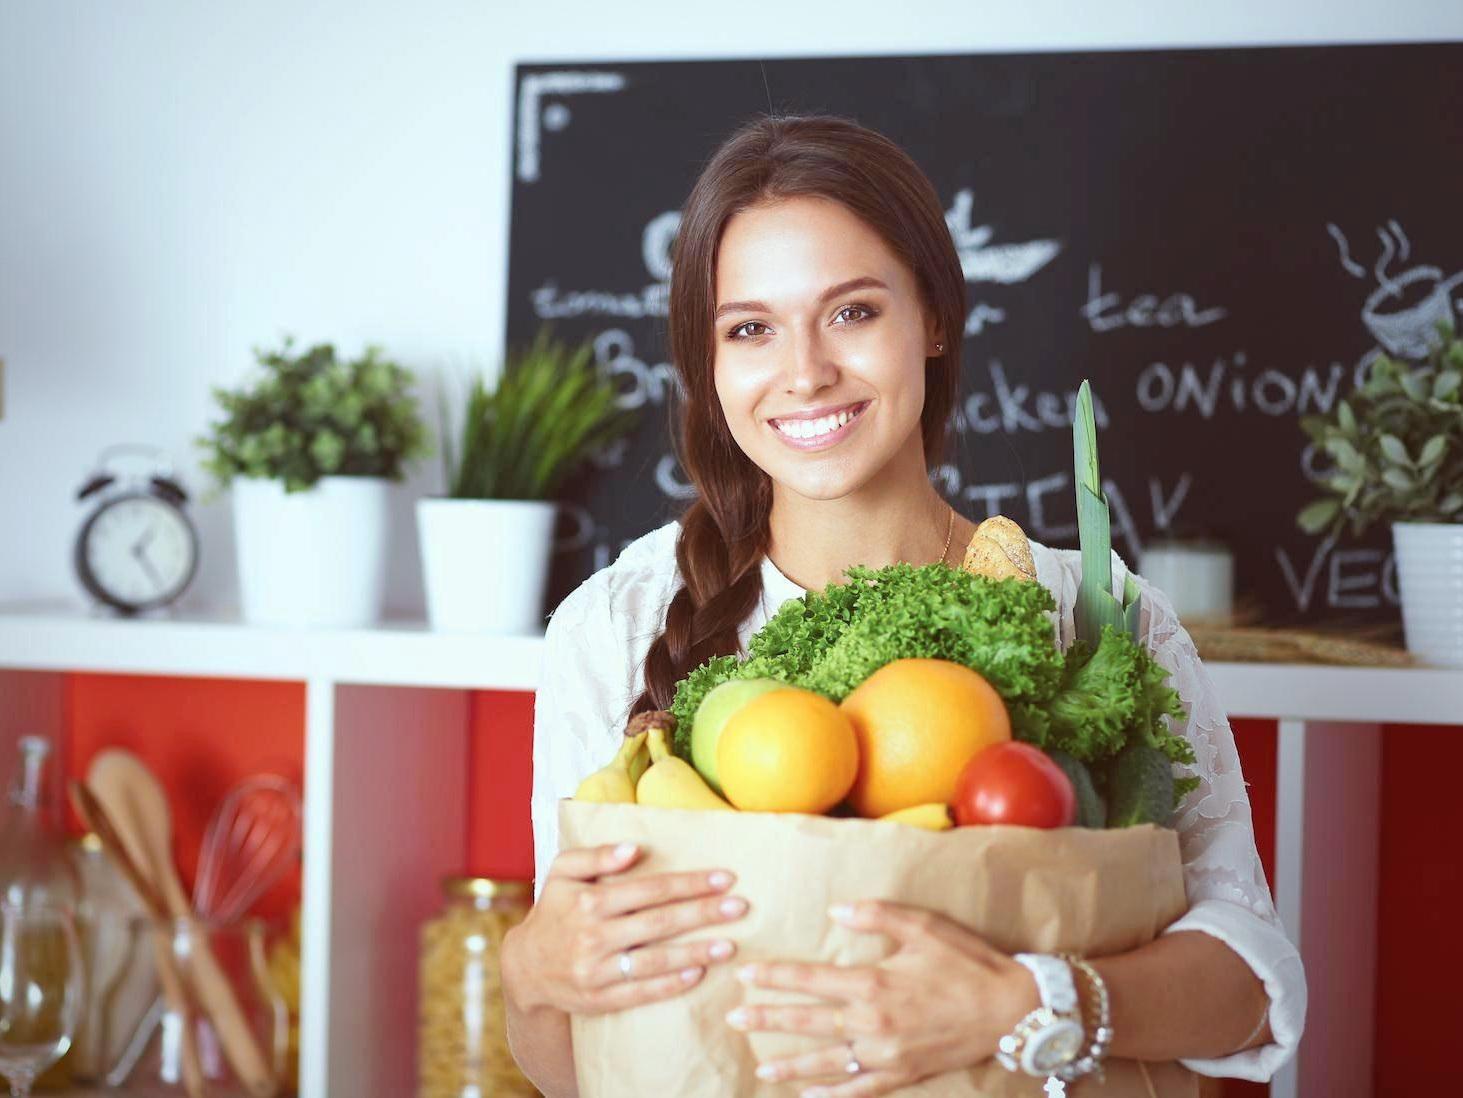 Diete et nutrition - Naturopathe - Massothérapie et naturopathie Zeina Raya Montreal